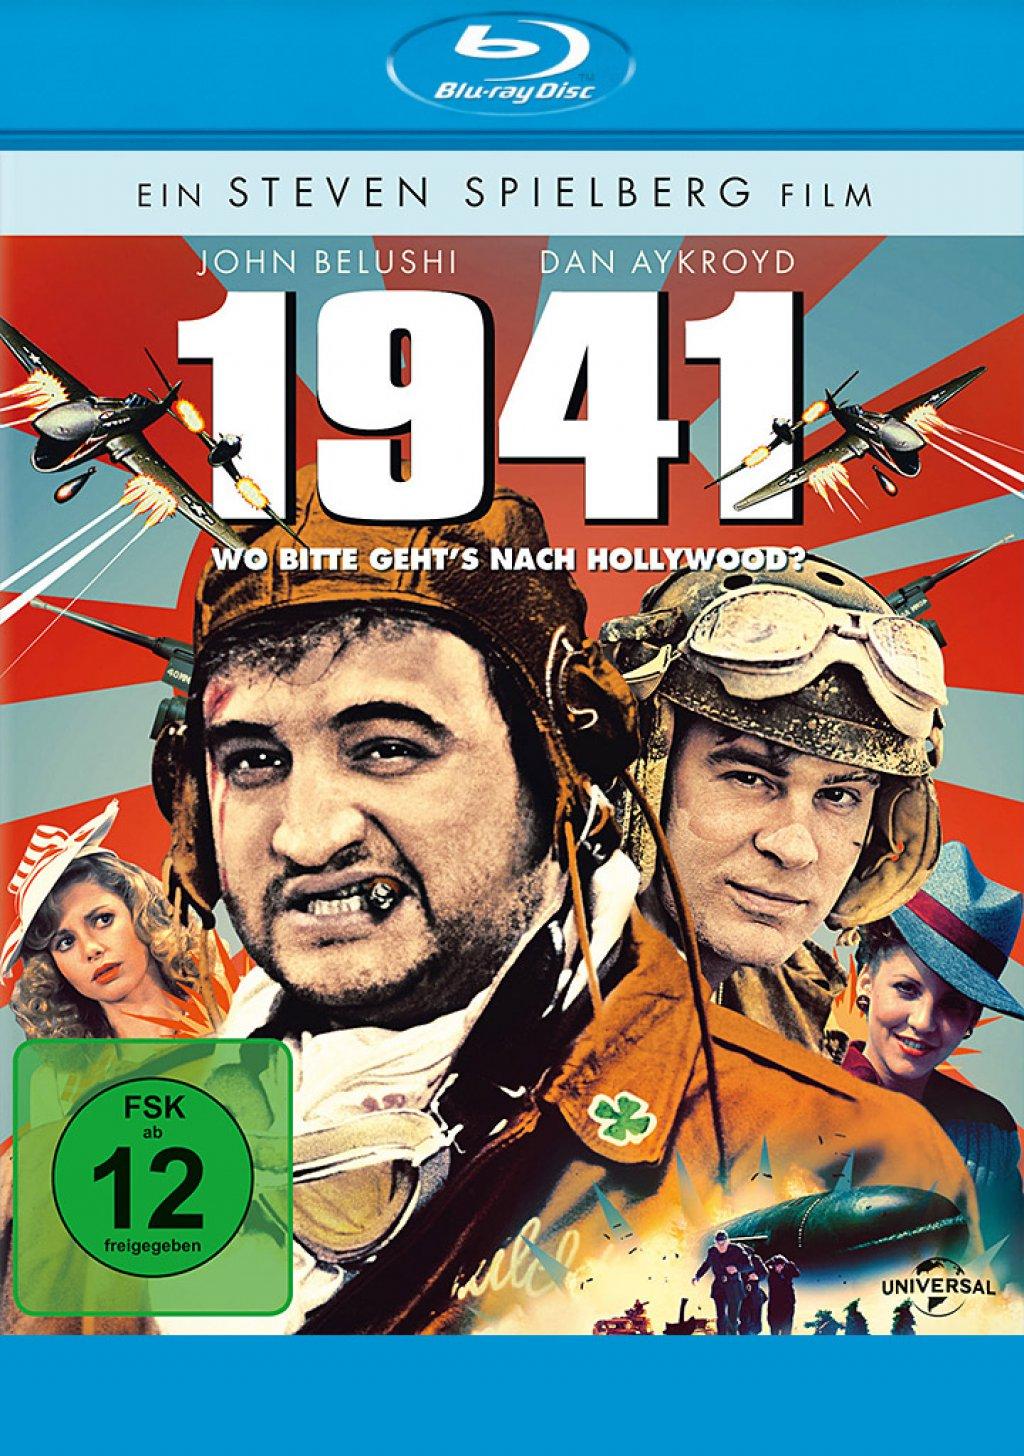 1941 - Wo bitte geht's nach Hollywood (Blu-ray)